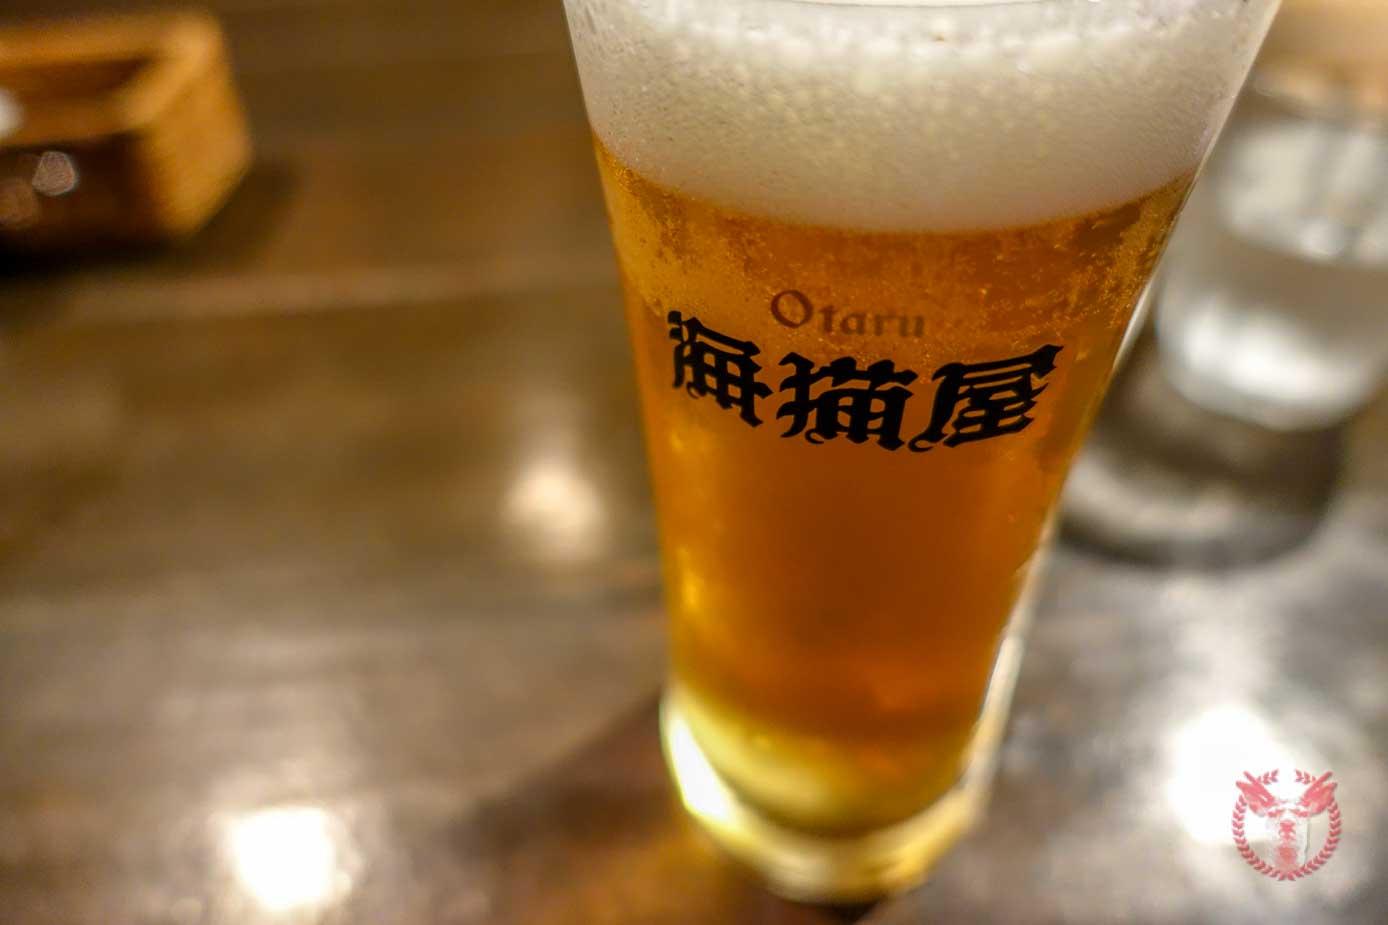 Uminekoya 2